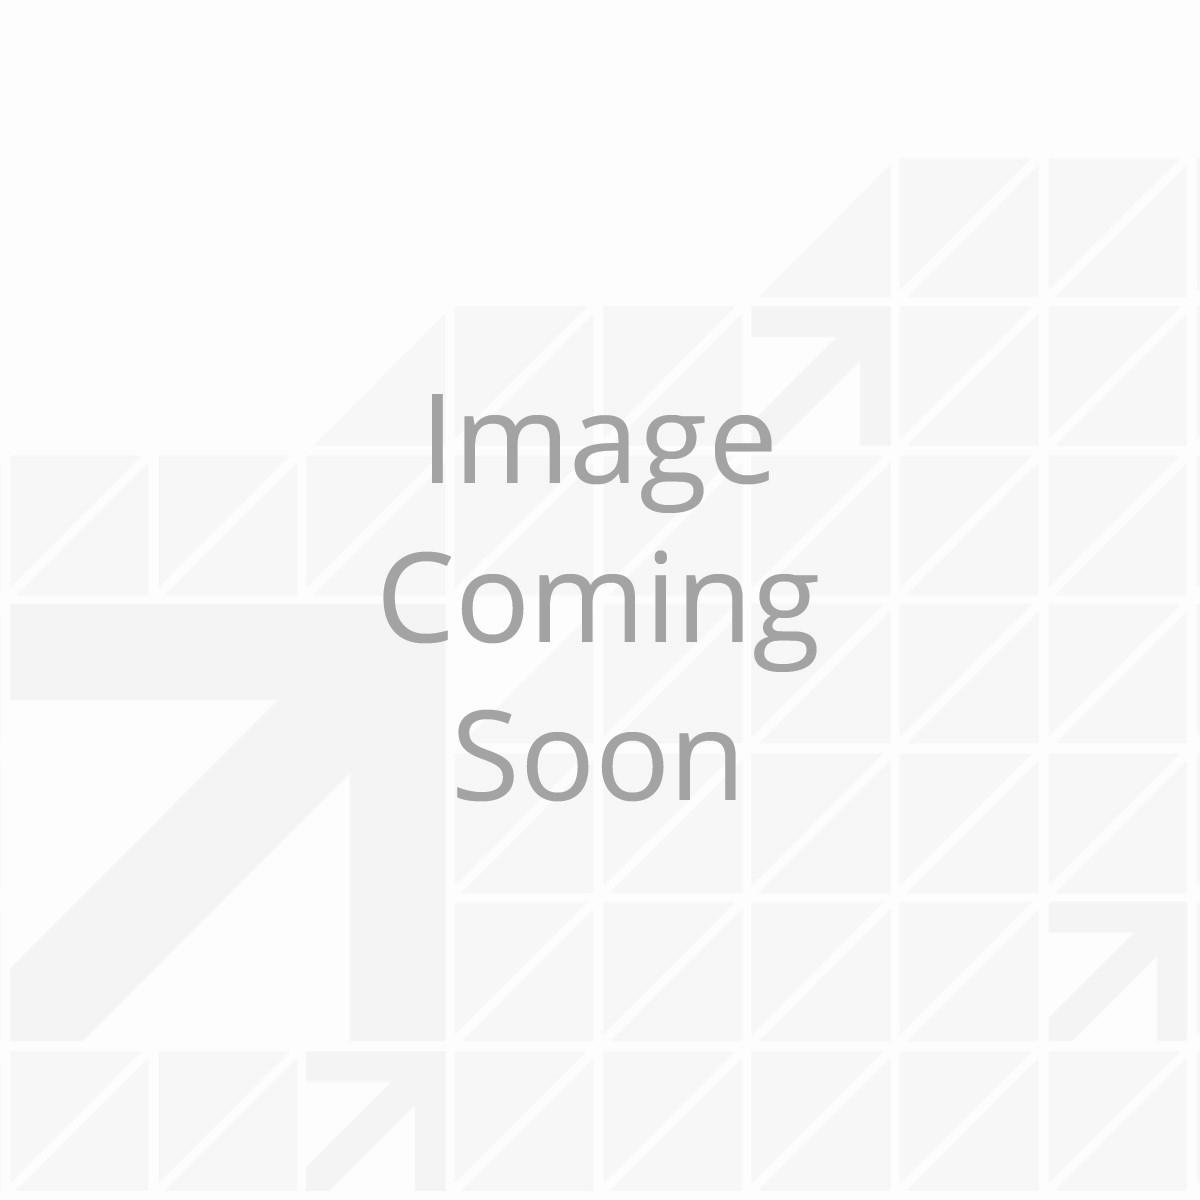 Amazon. Com: lippert components 333966 universal mount manual.